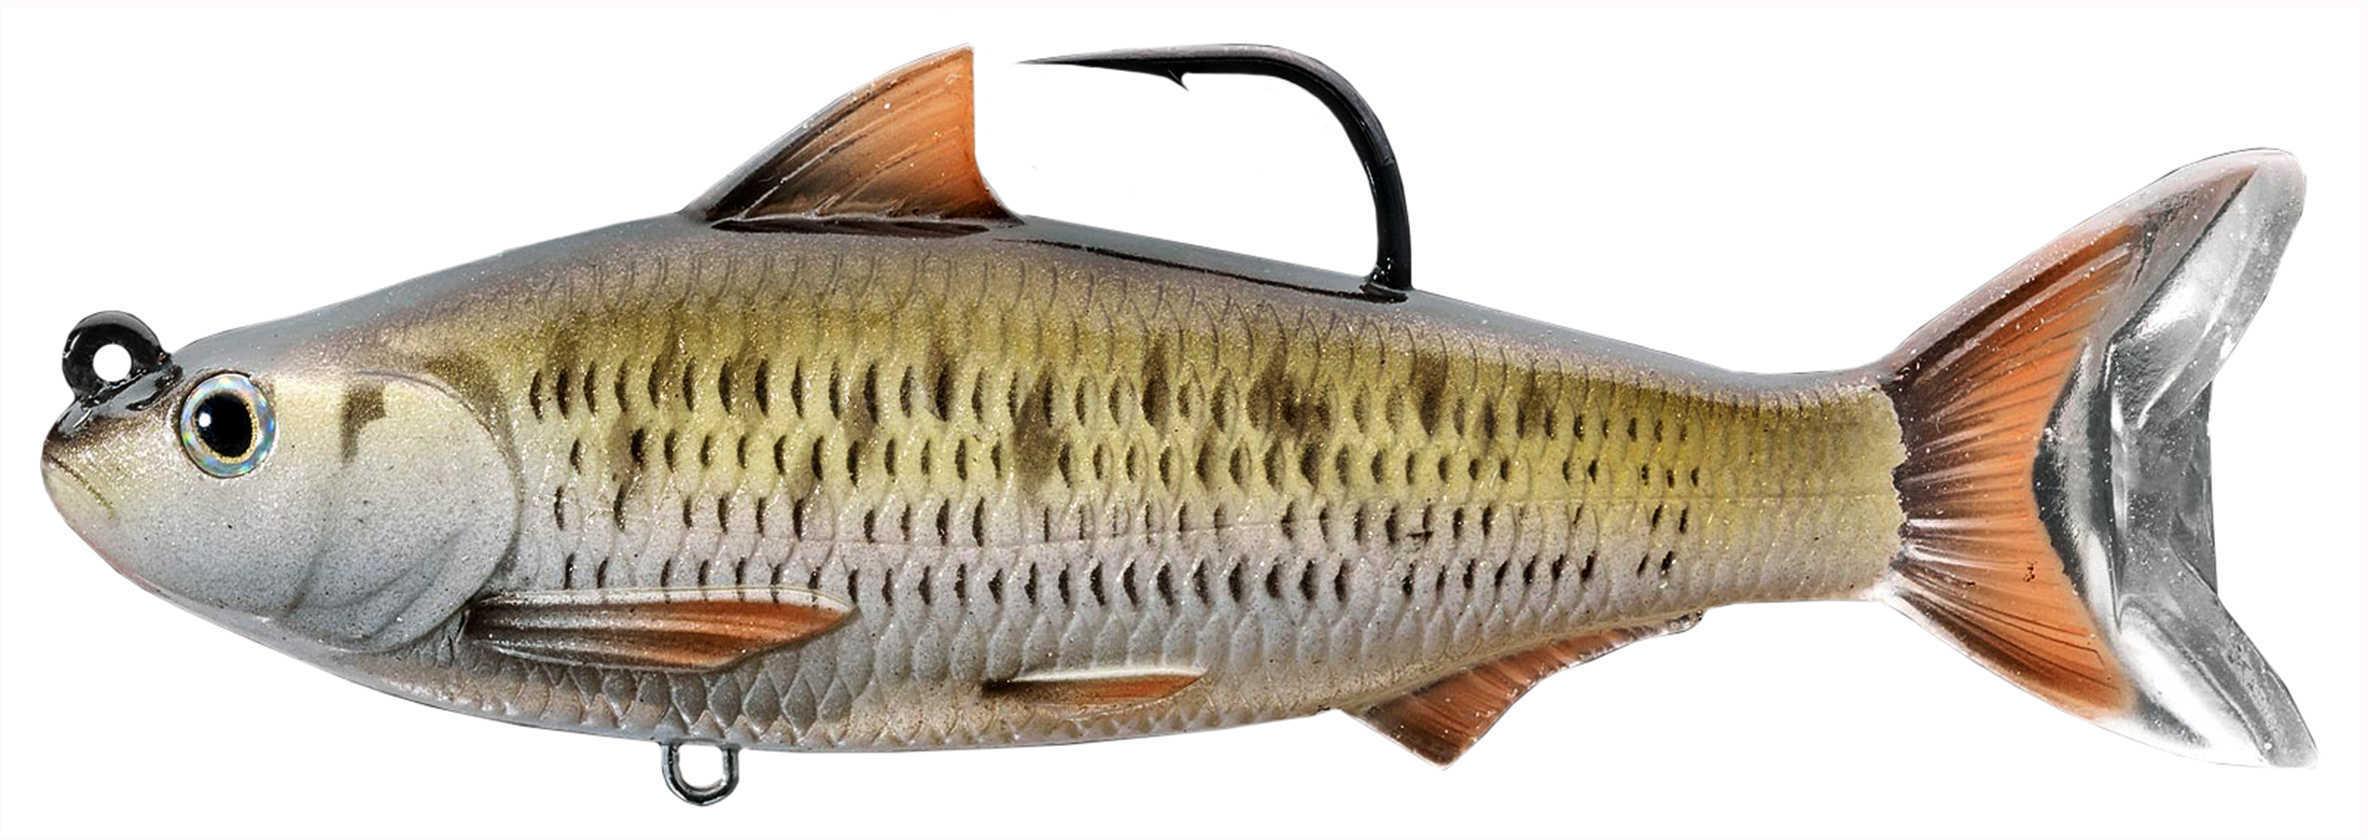 "LiveTarget Lures Common Shiner Swimbait Freshwater, 6"" Length, 1'-12' Depth, 2 1/4 oz Weight, Silver/Bronze, Per 1 Md: C"